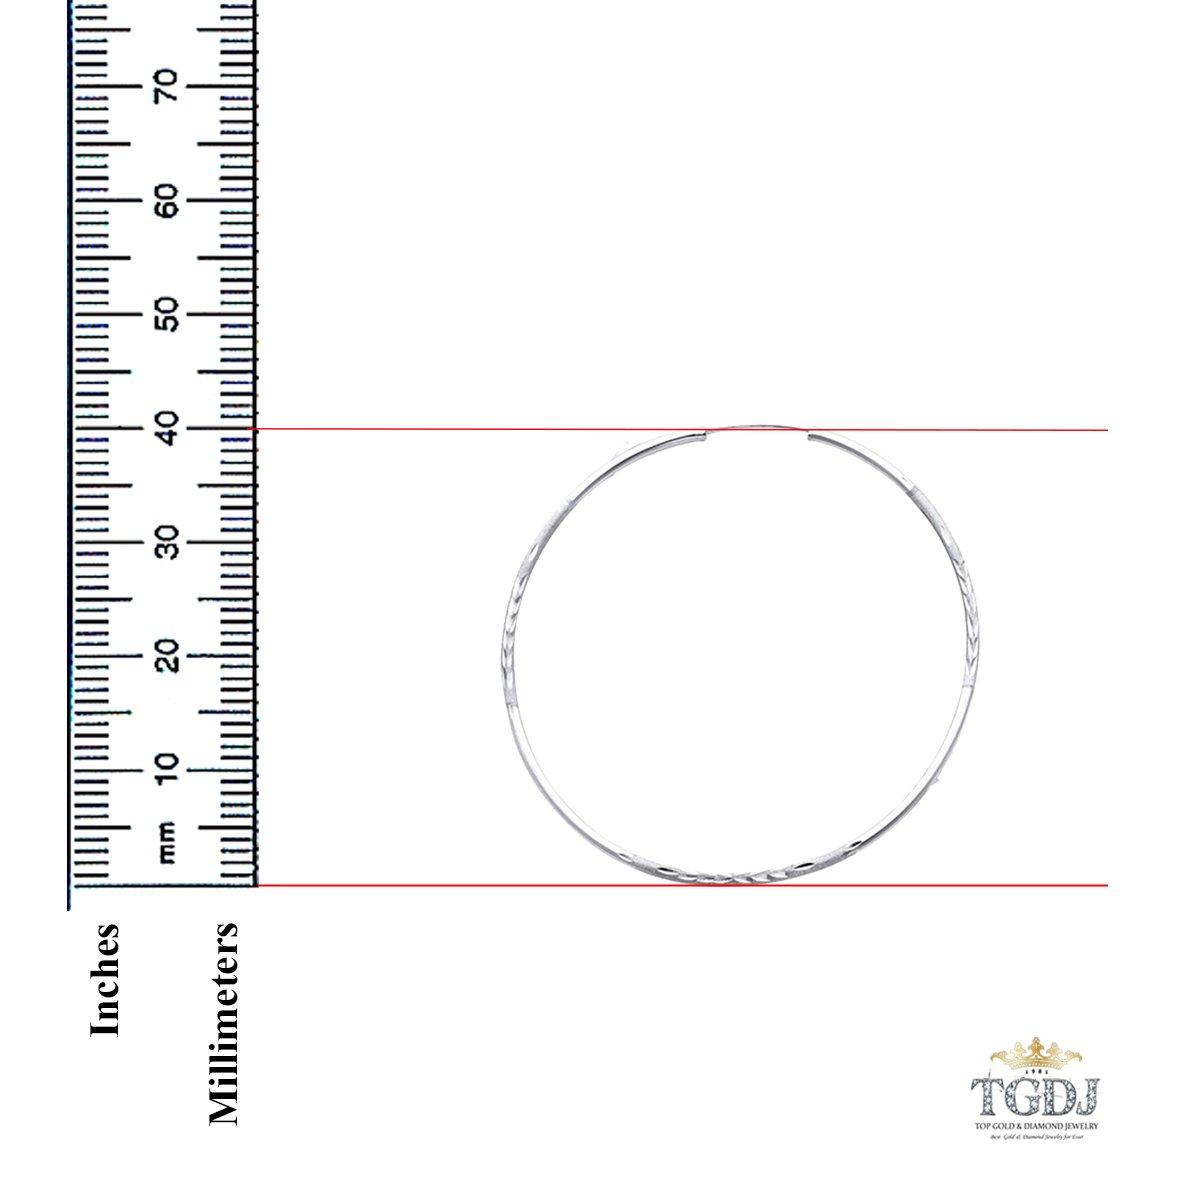 40mm Diameter 14k White Gold 2mm Thickness Endless Diamond Cut Hoop Earrings